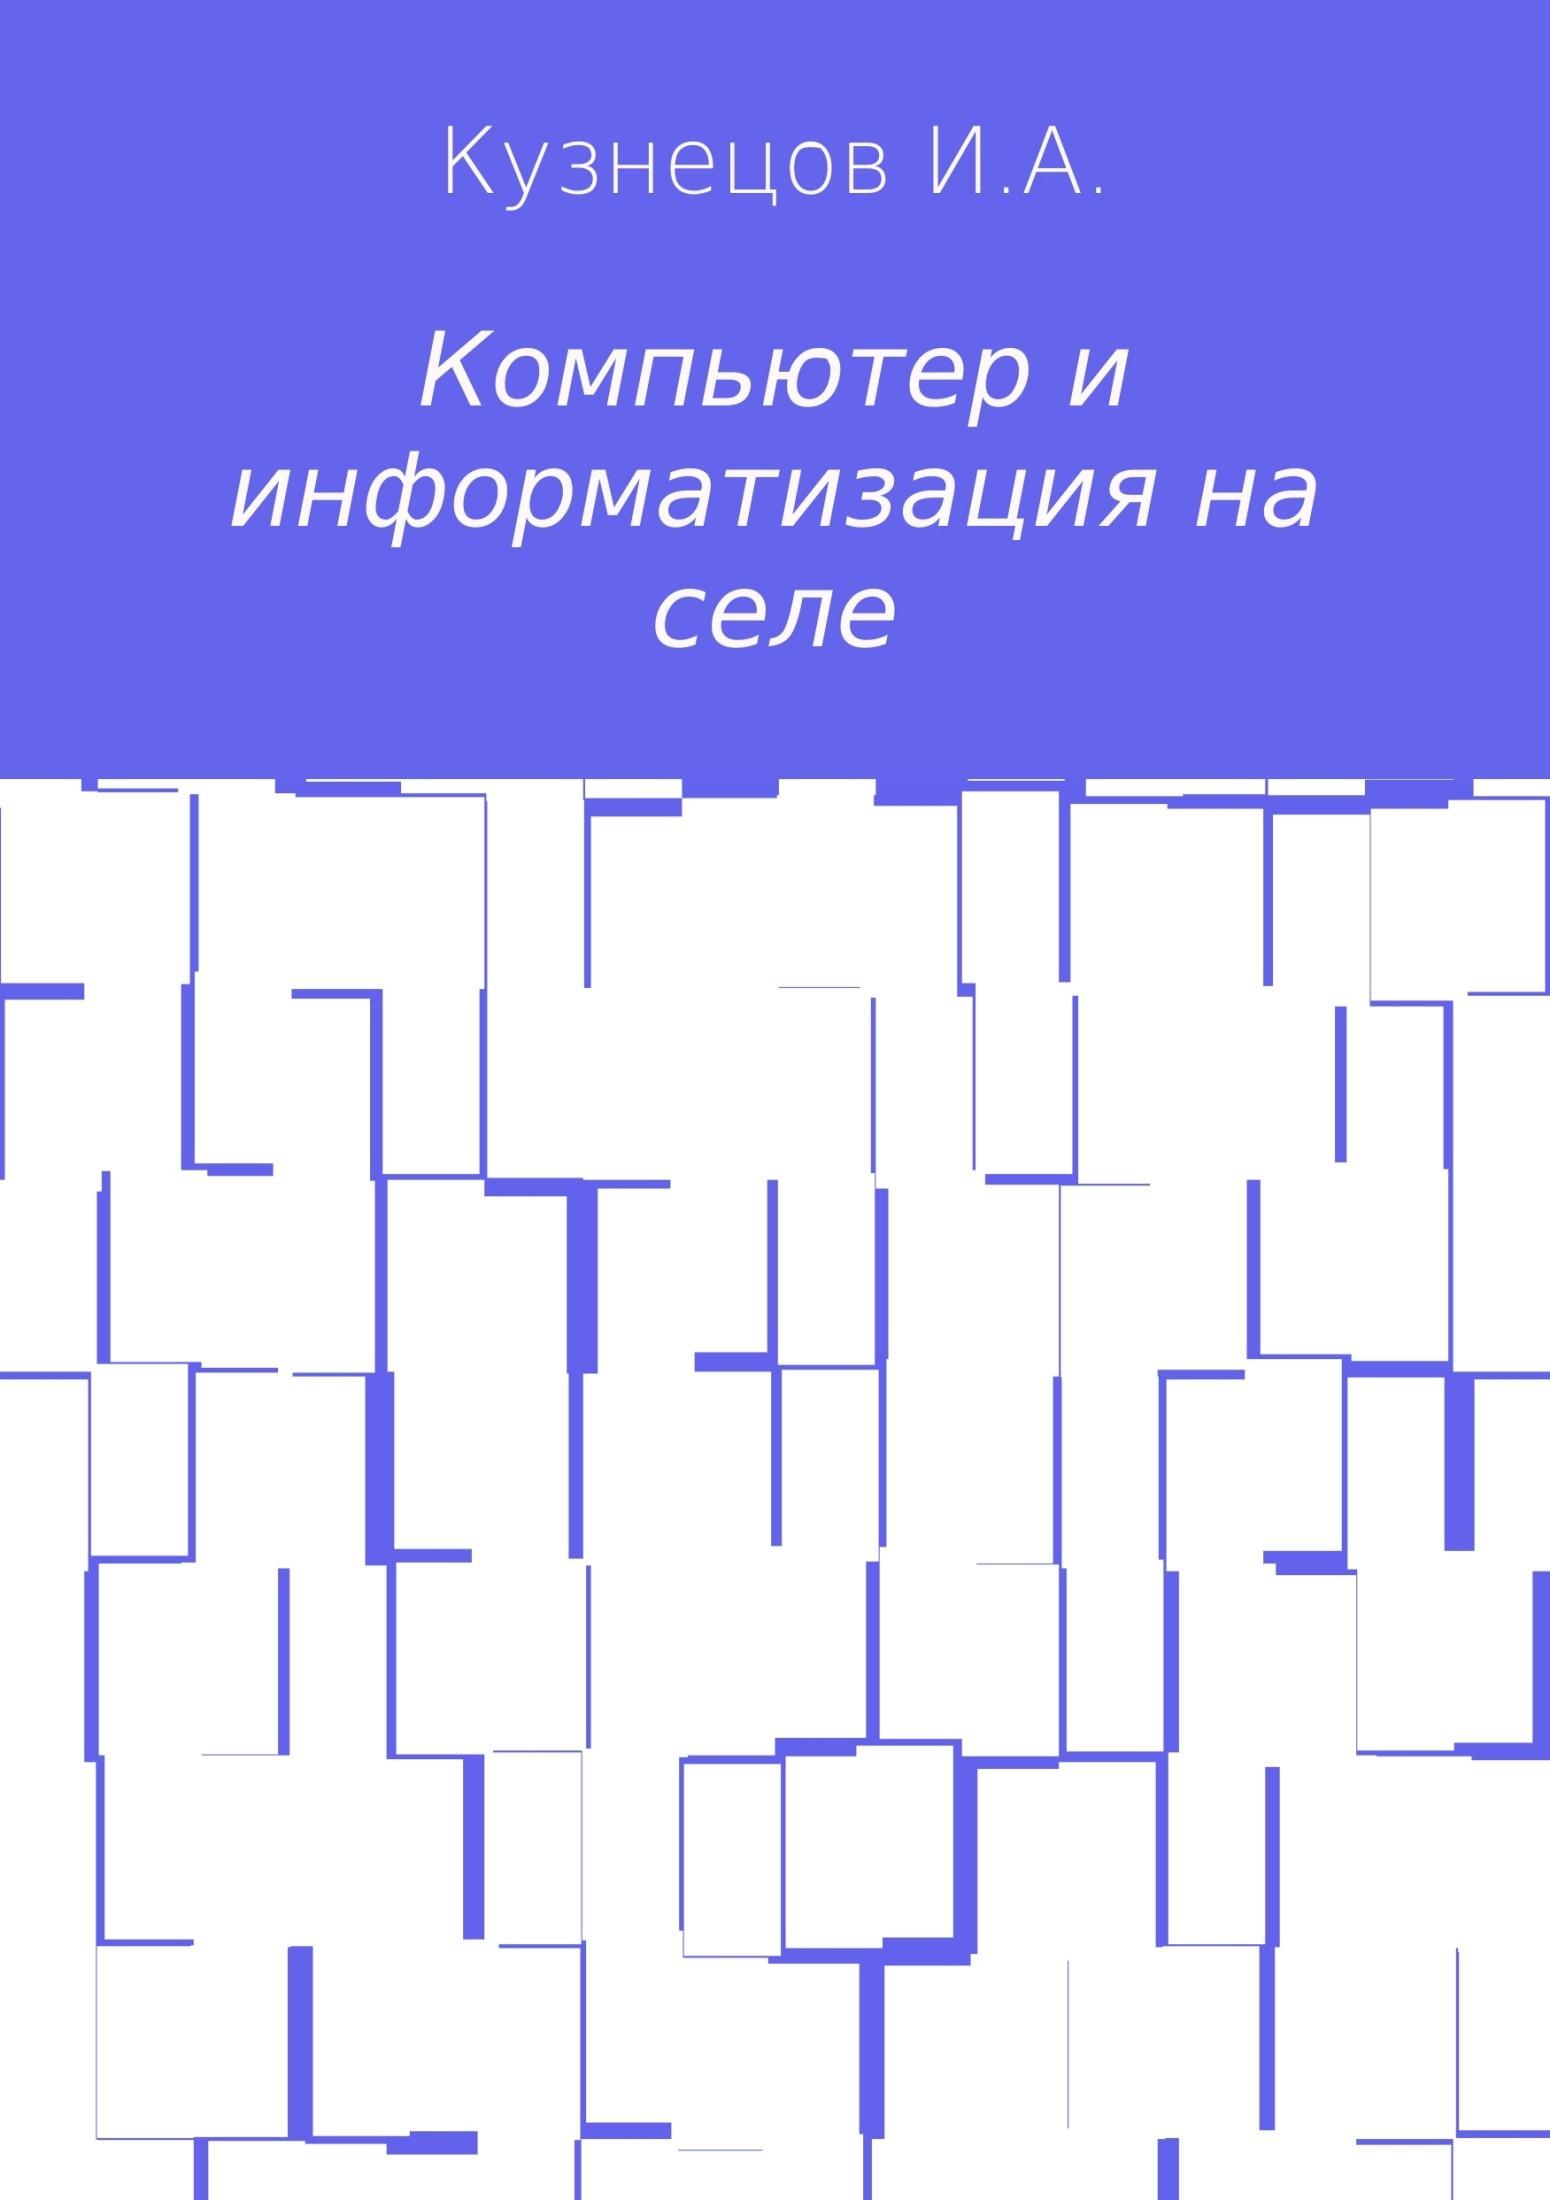 Компьютер и информатизация на селе